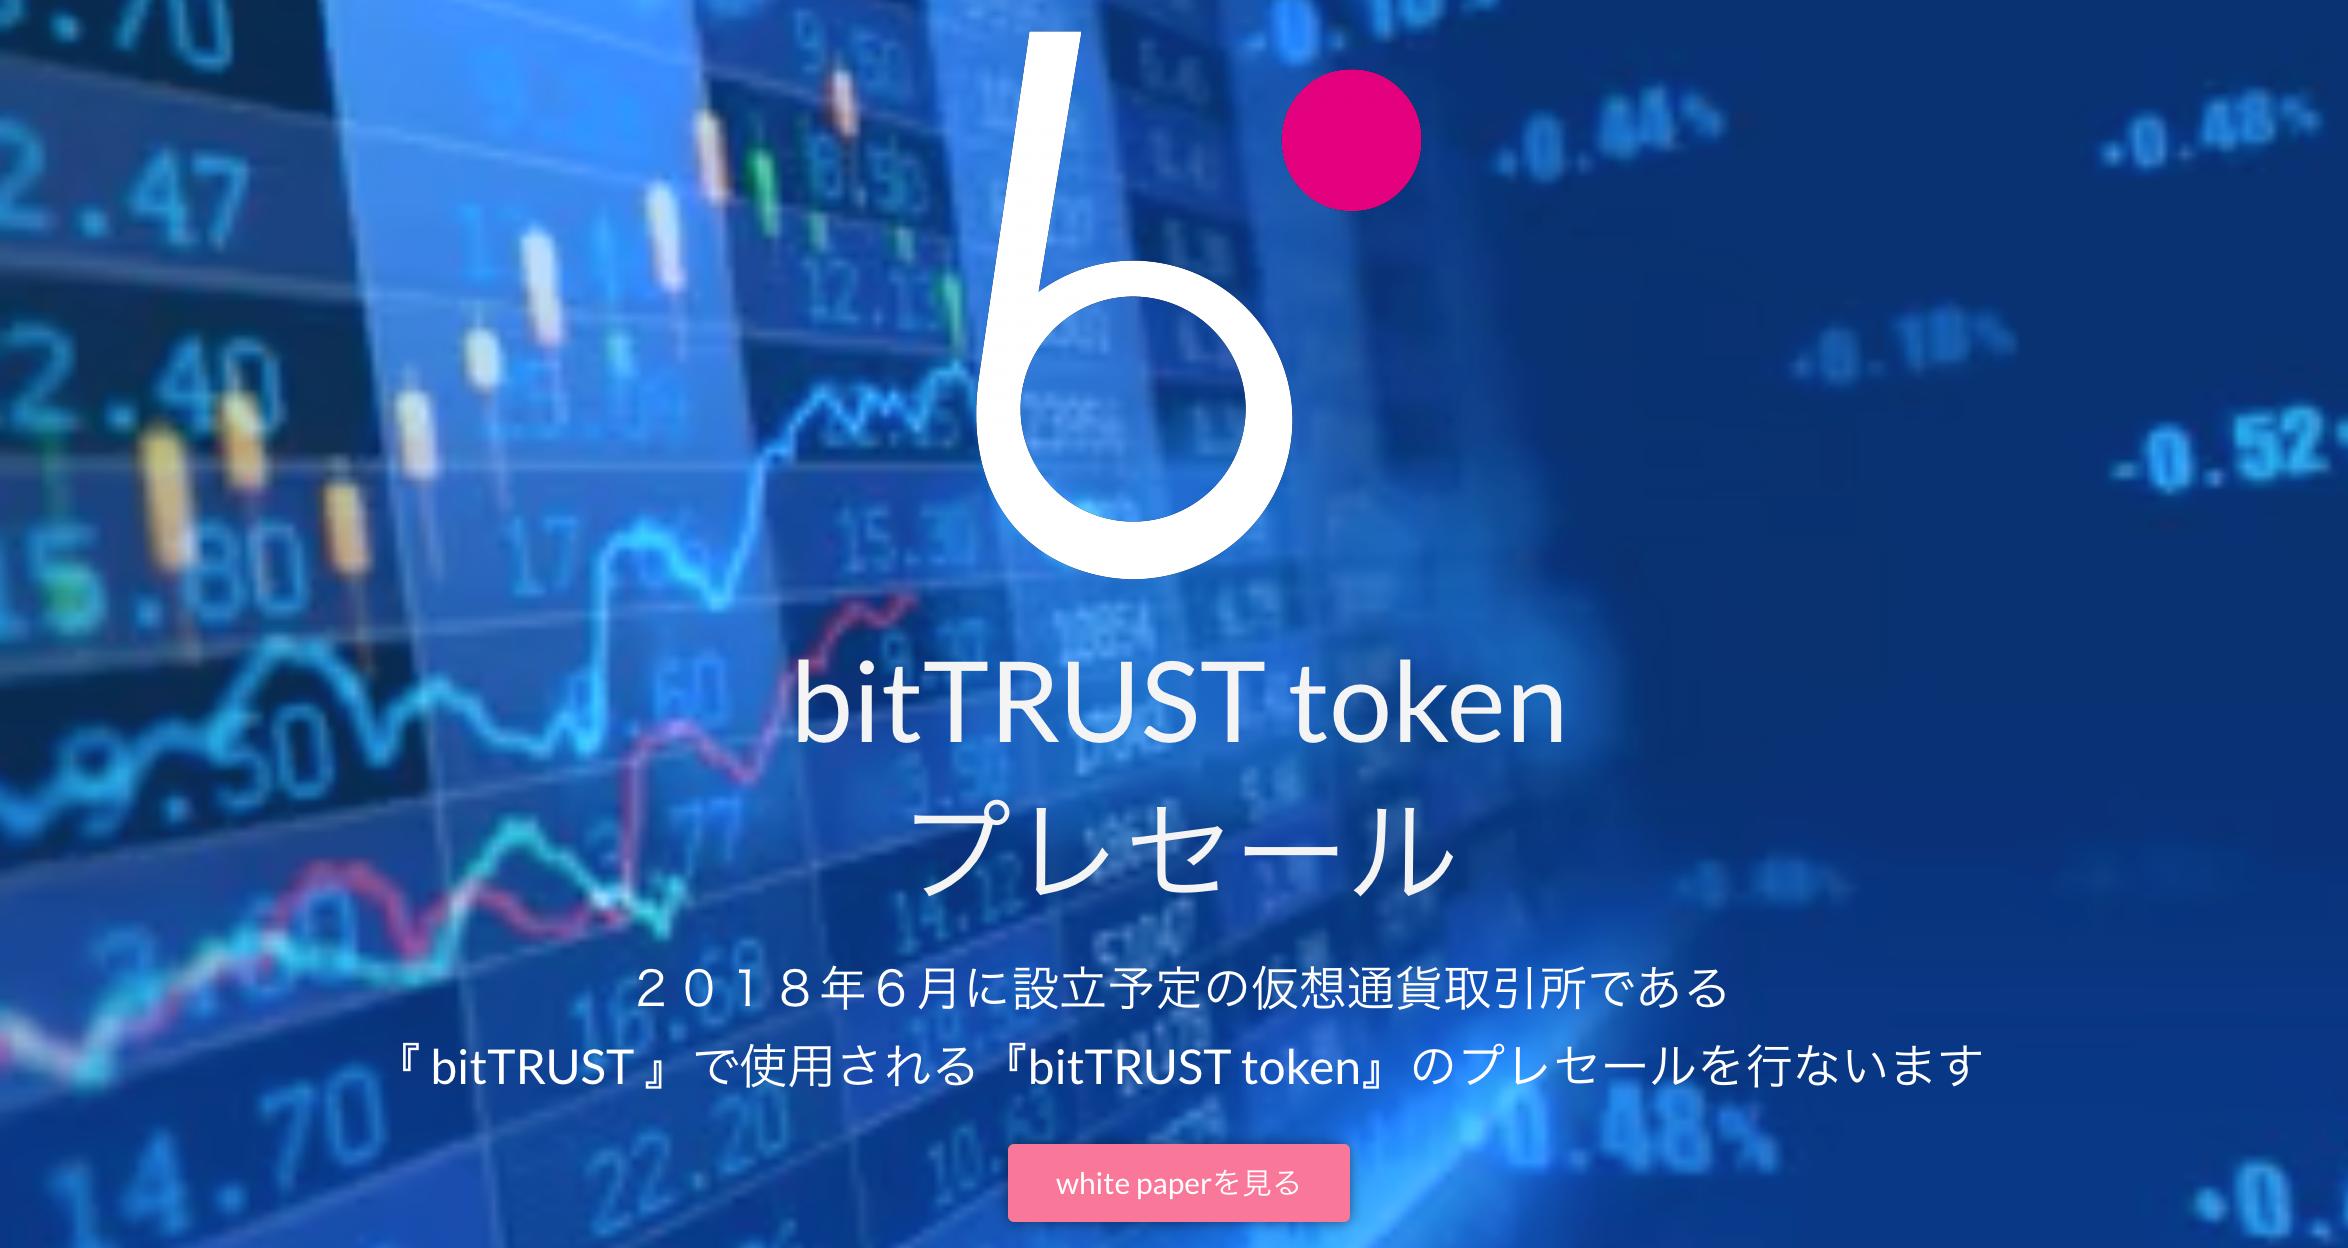 Bittrust(BTR) ICO